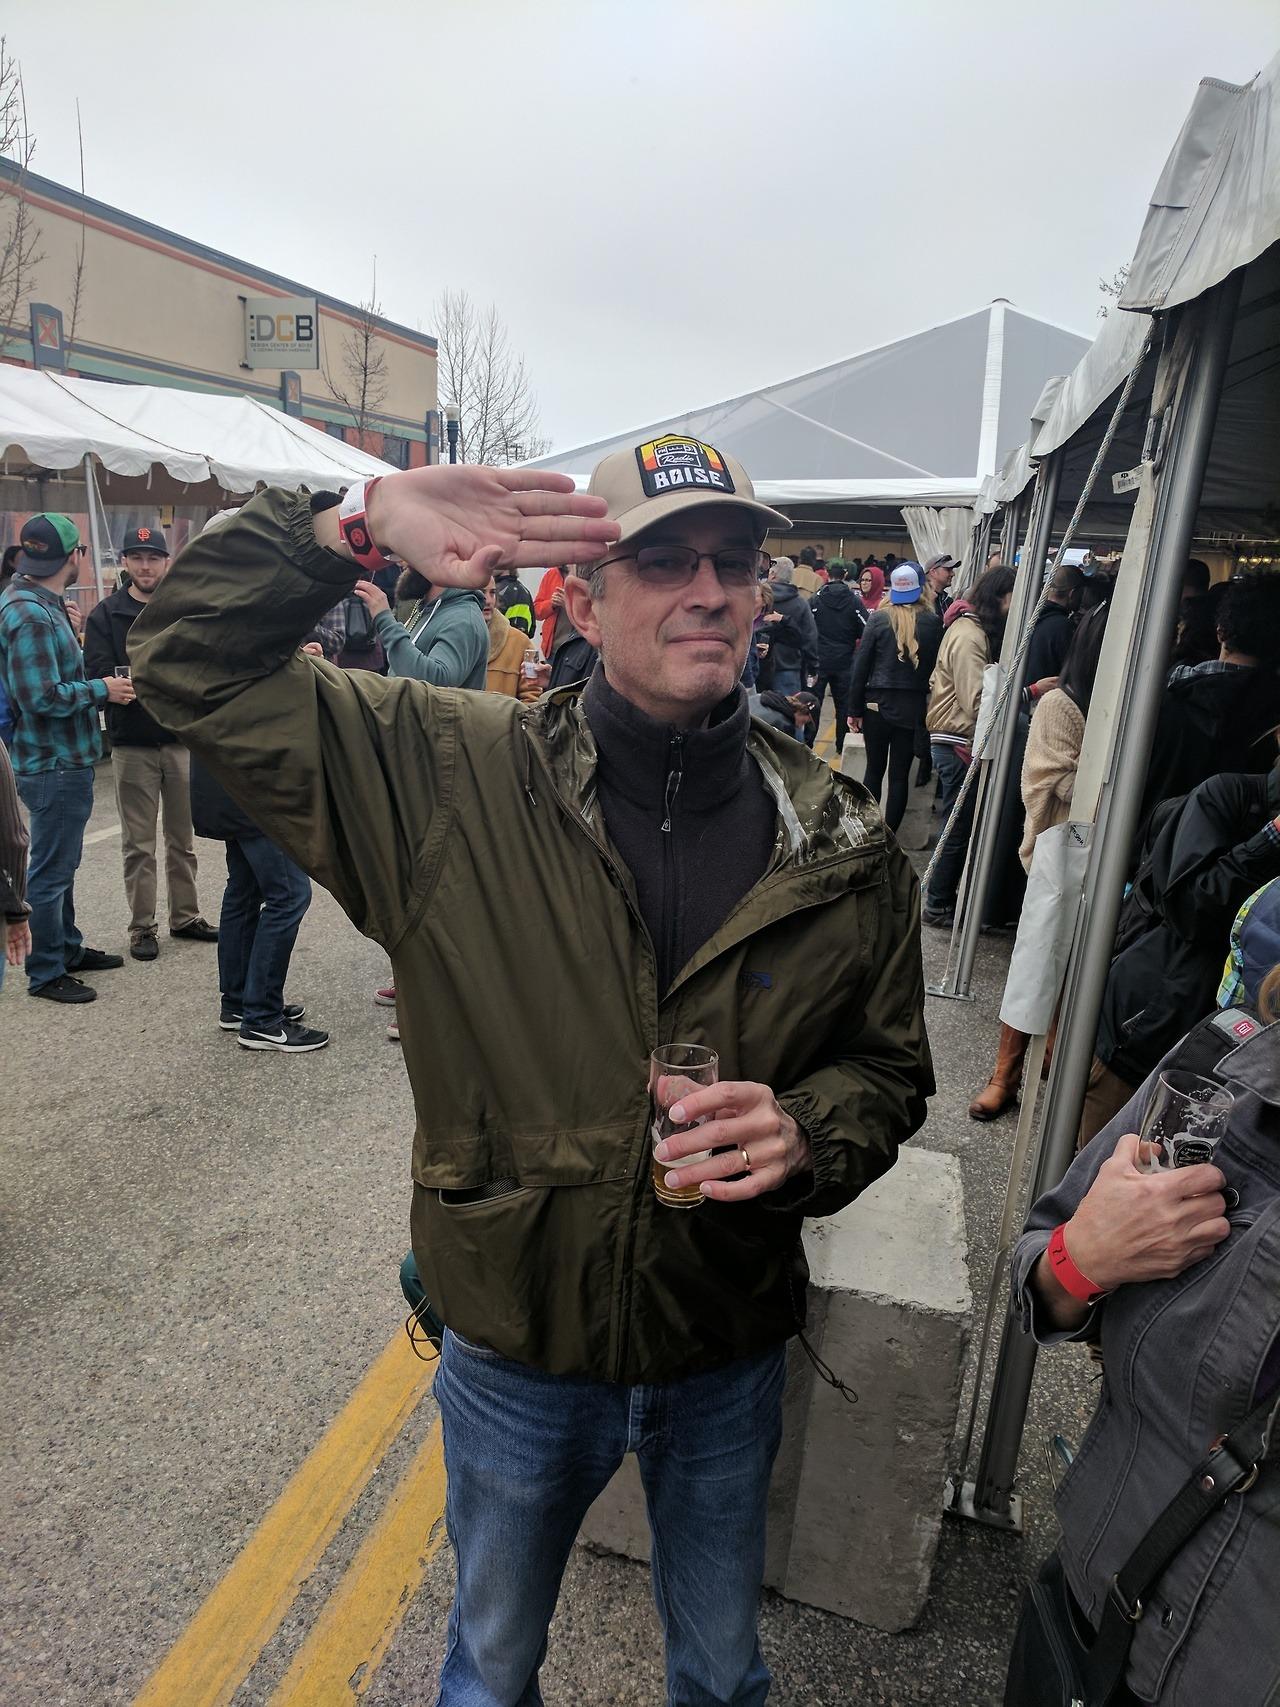 Radio Boise fans in Alefort! -stg